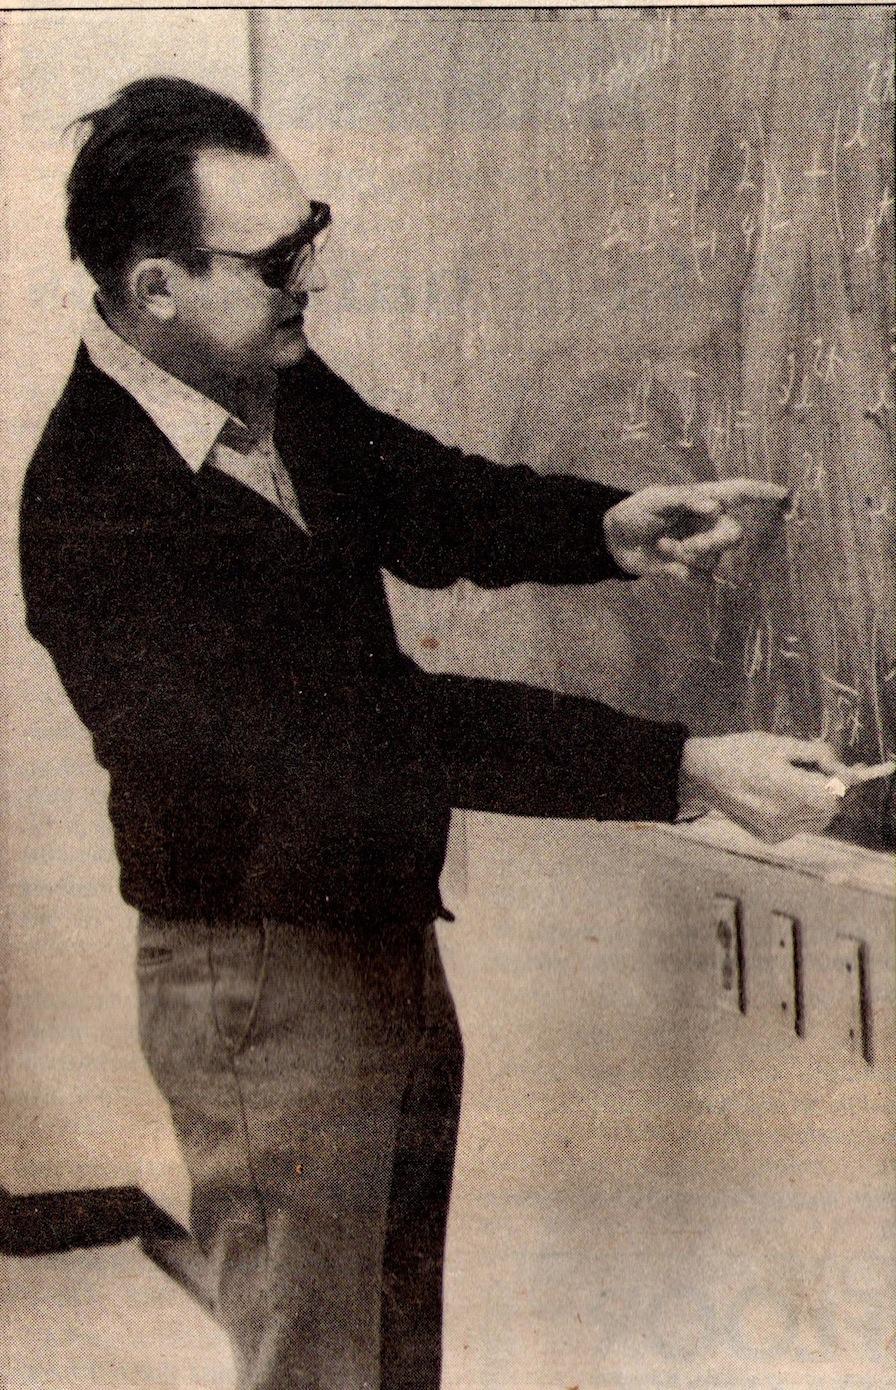 Thomas Andrew Bronikowski, a Marquette mathematics professor for 25 years, permanently lost his eyesight at age 47. Photo courtesy of Clara Janzen.